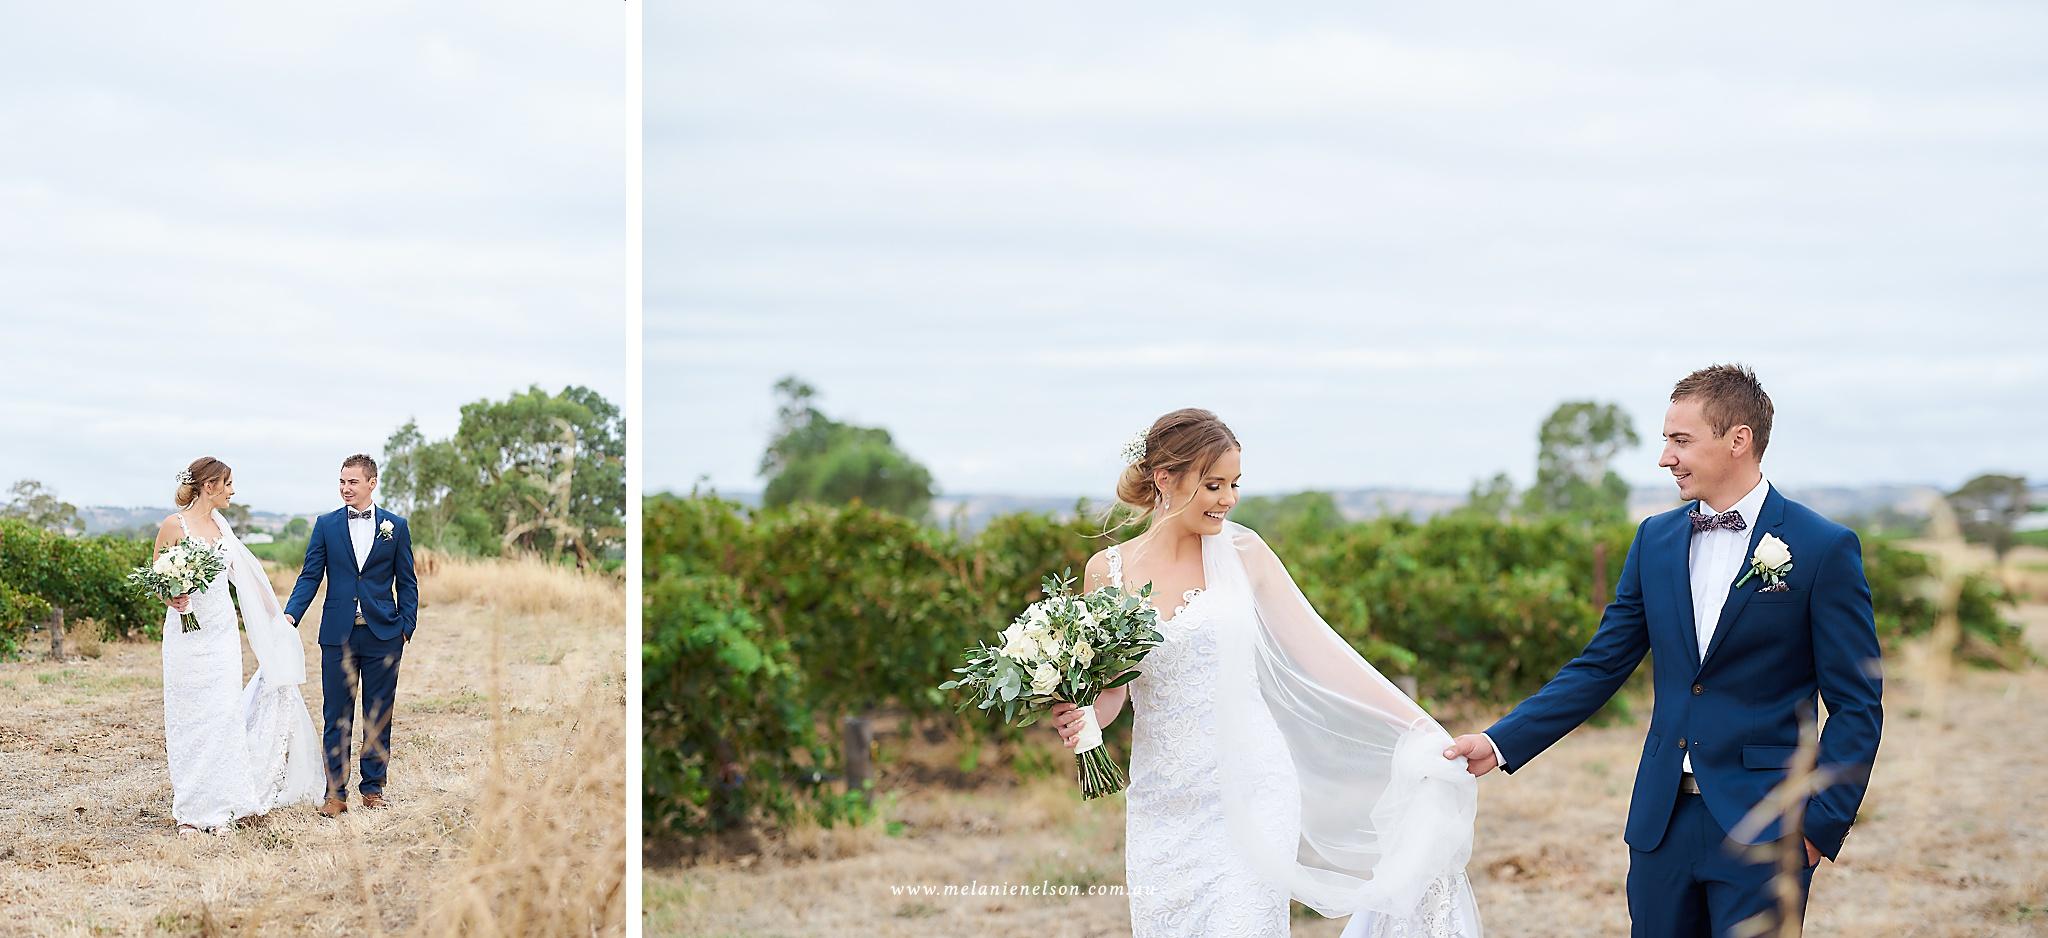 serafino_wedding_photography_0060.jpg